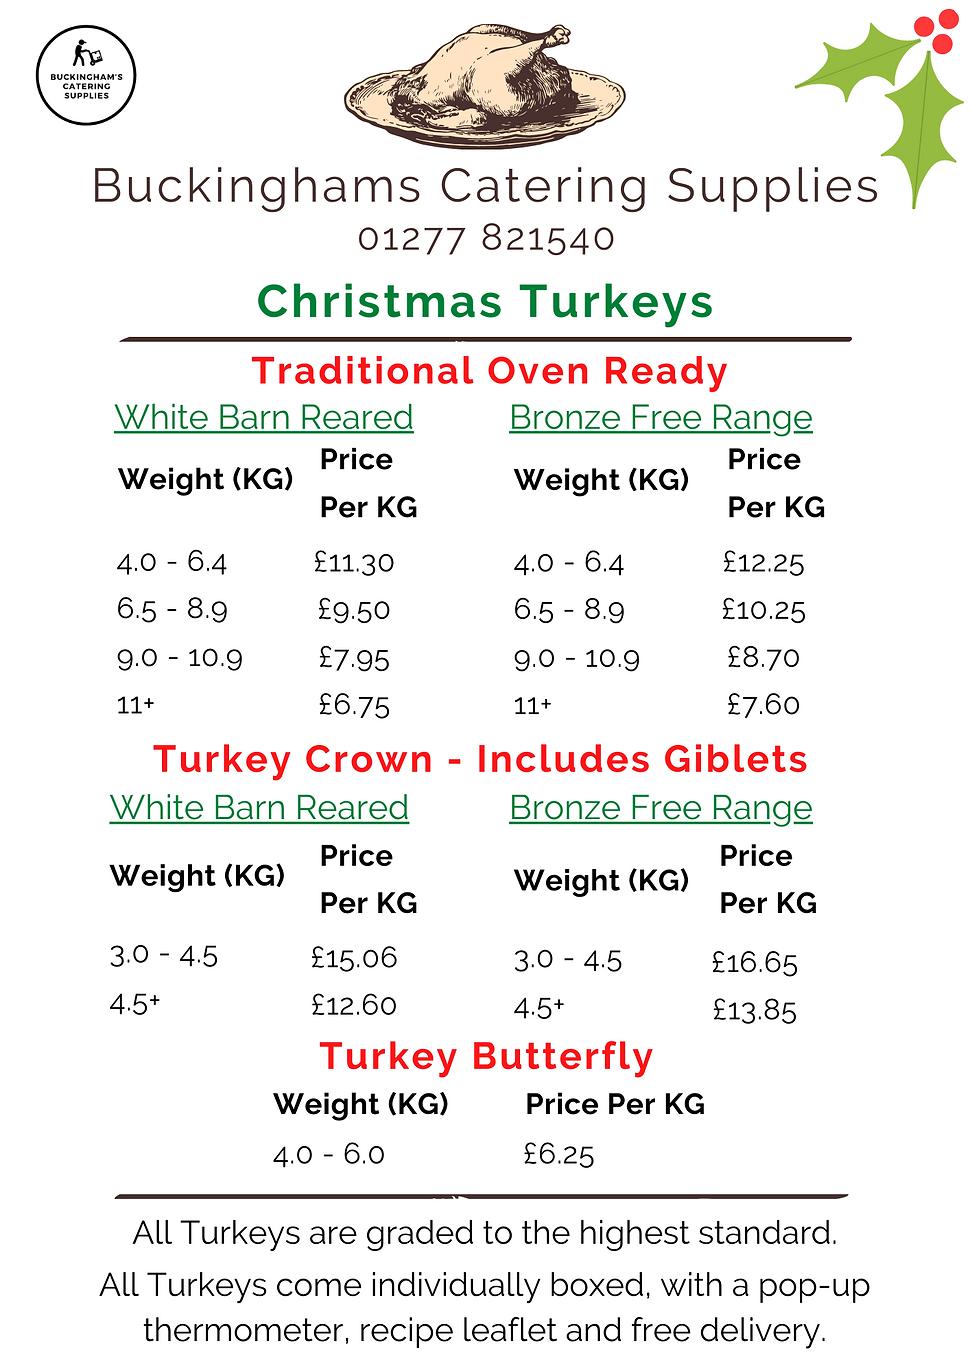 Buckinghams Turkey Price List 2020.png